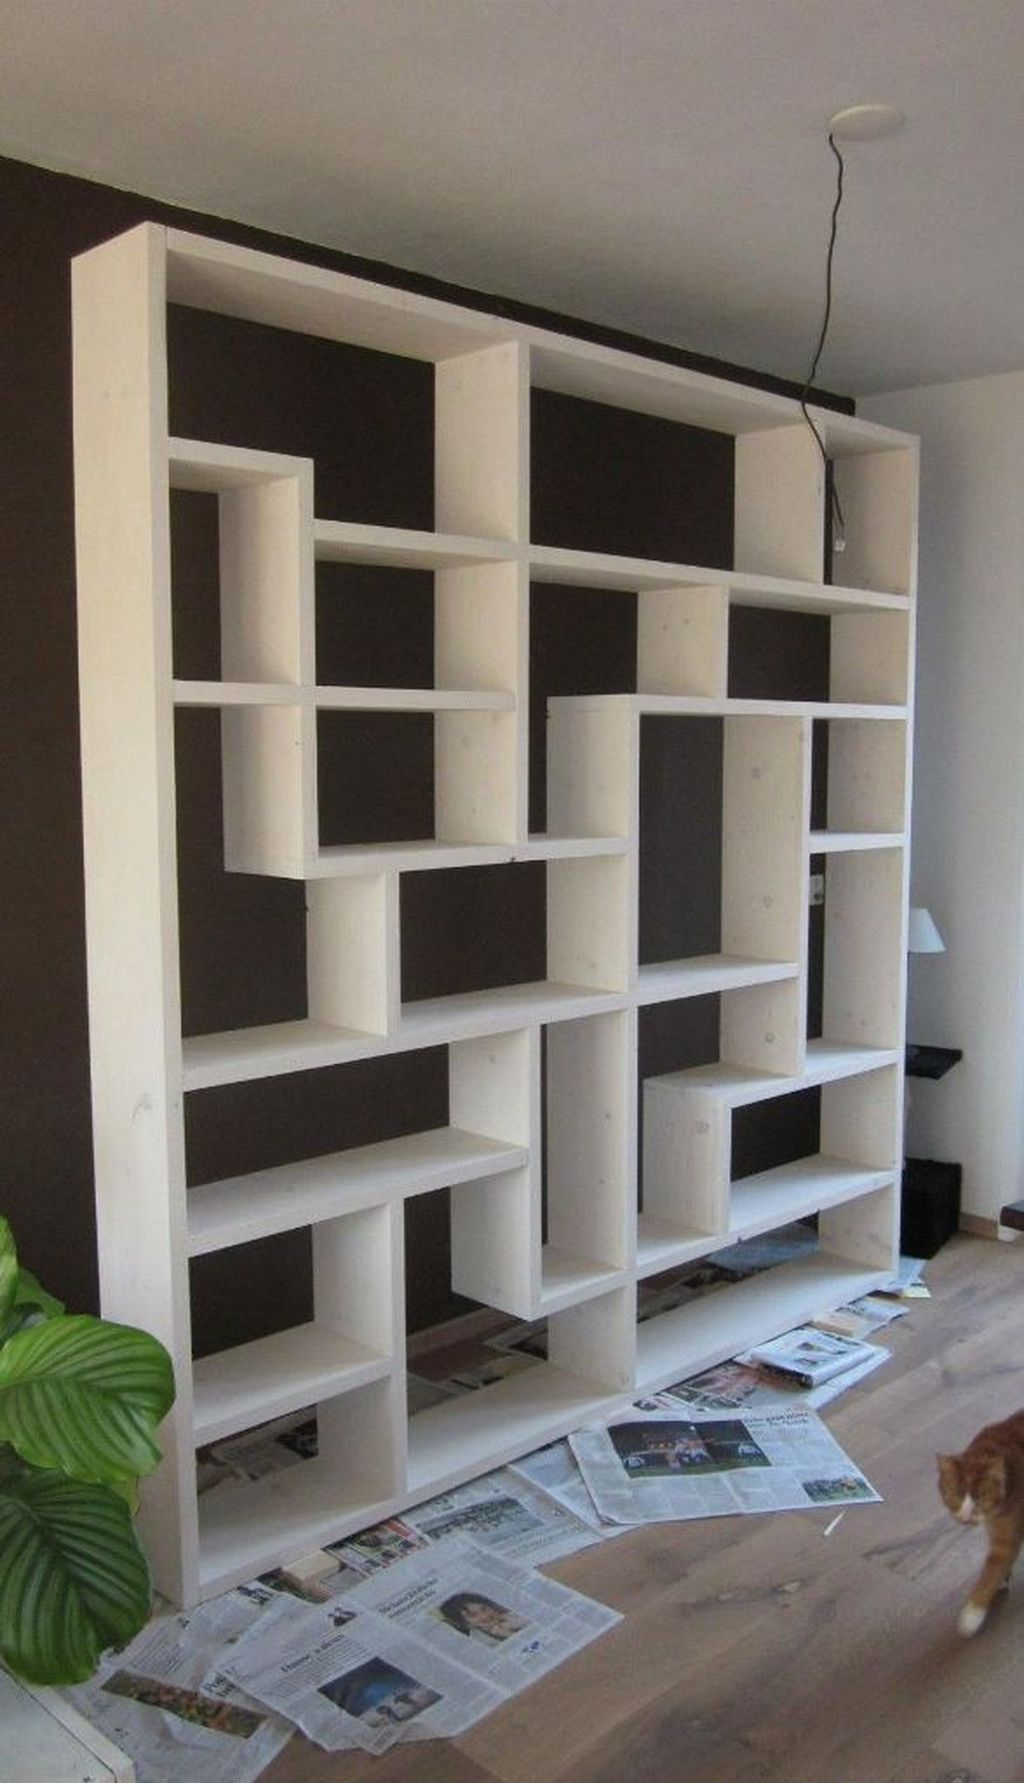 32 Stylish Bookshelf Design Ideas That Have An Essential Furniture